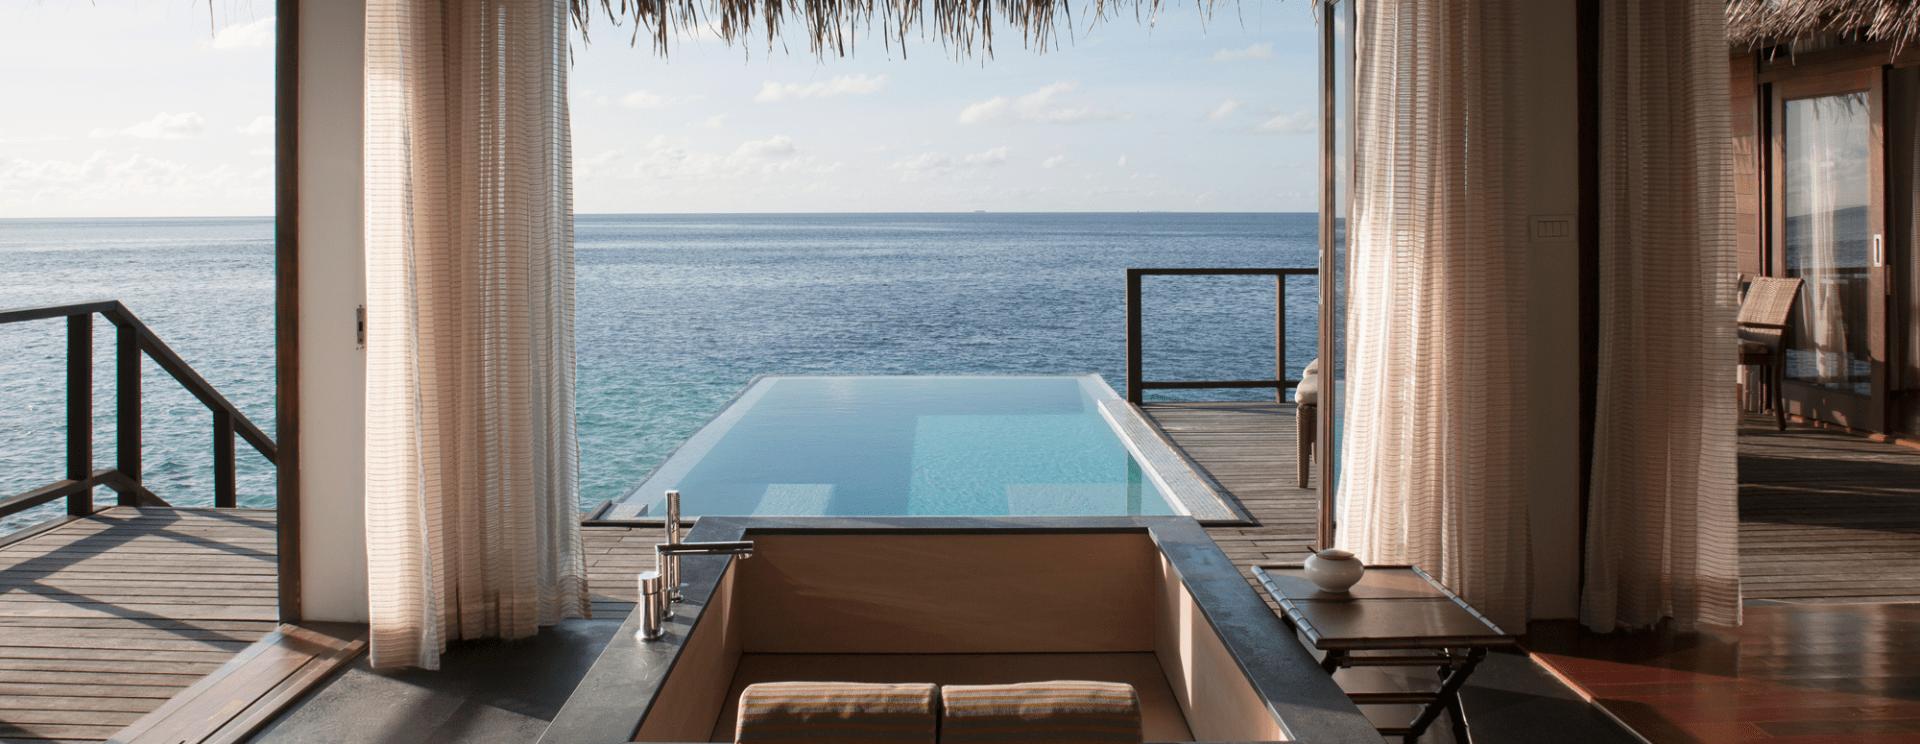 Coco Bodu Hithi Resort - General